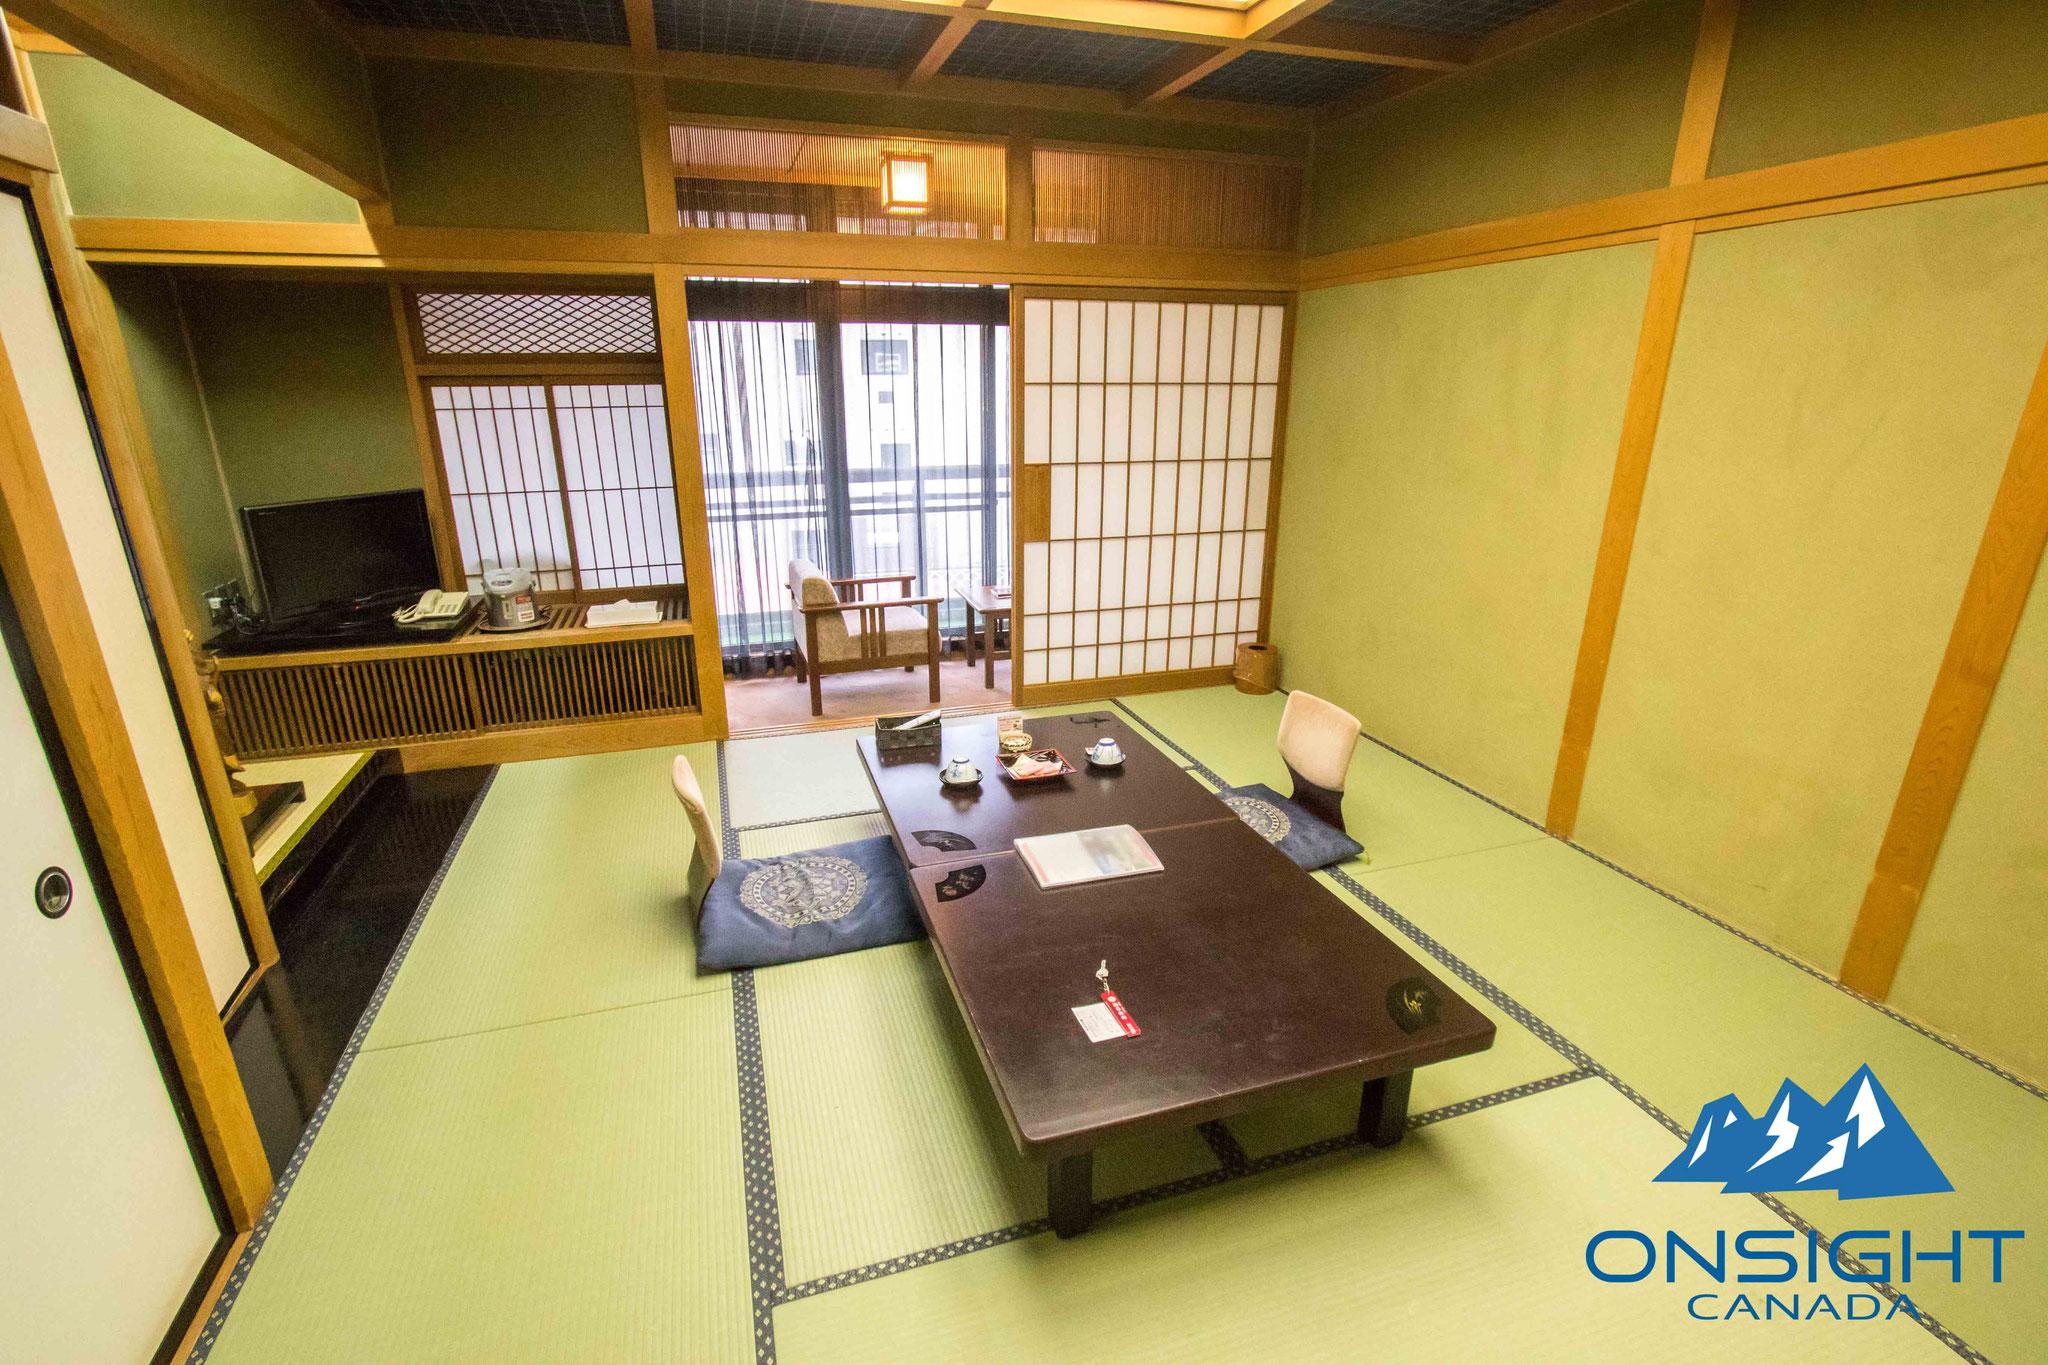 Fancy tatami room